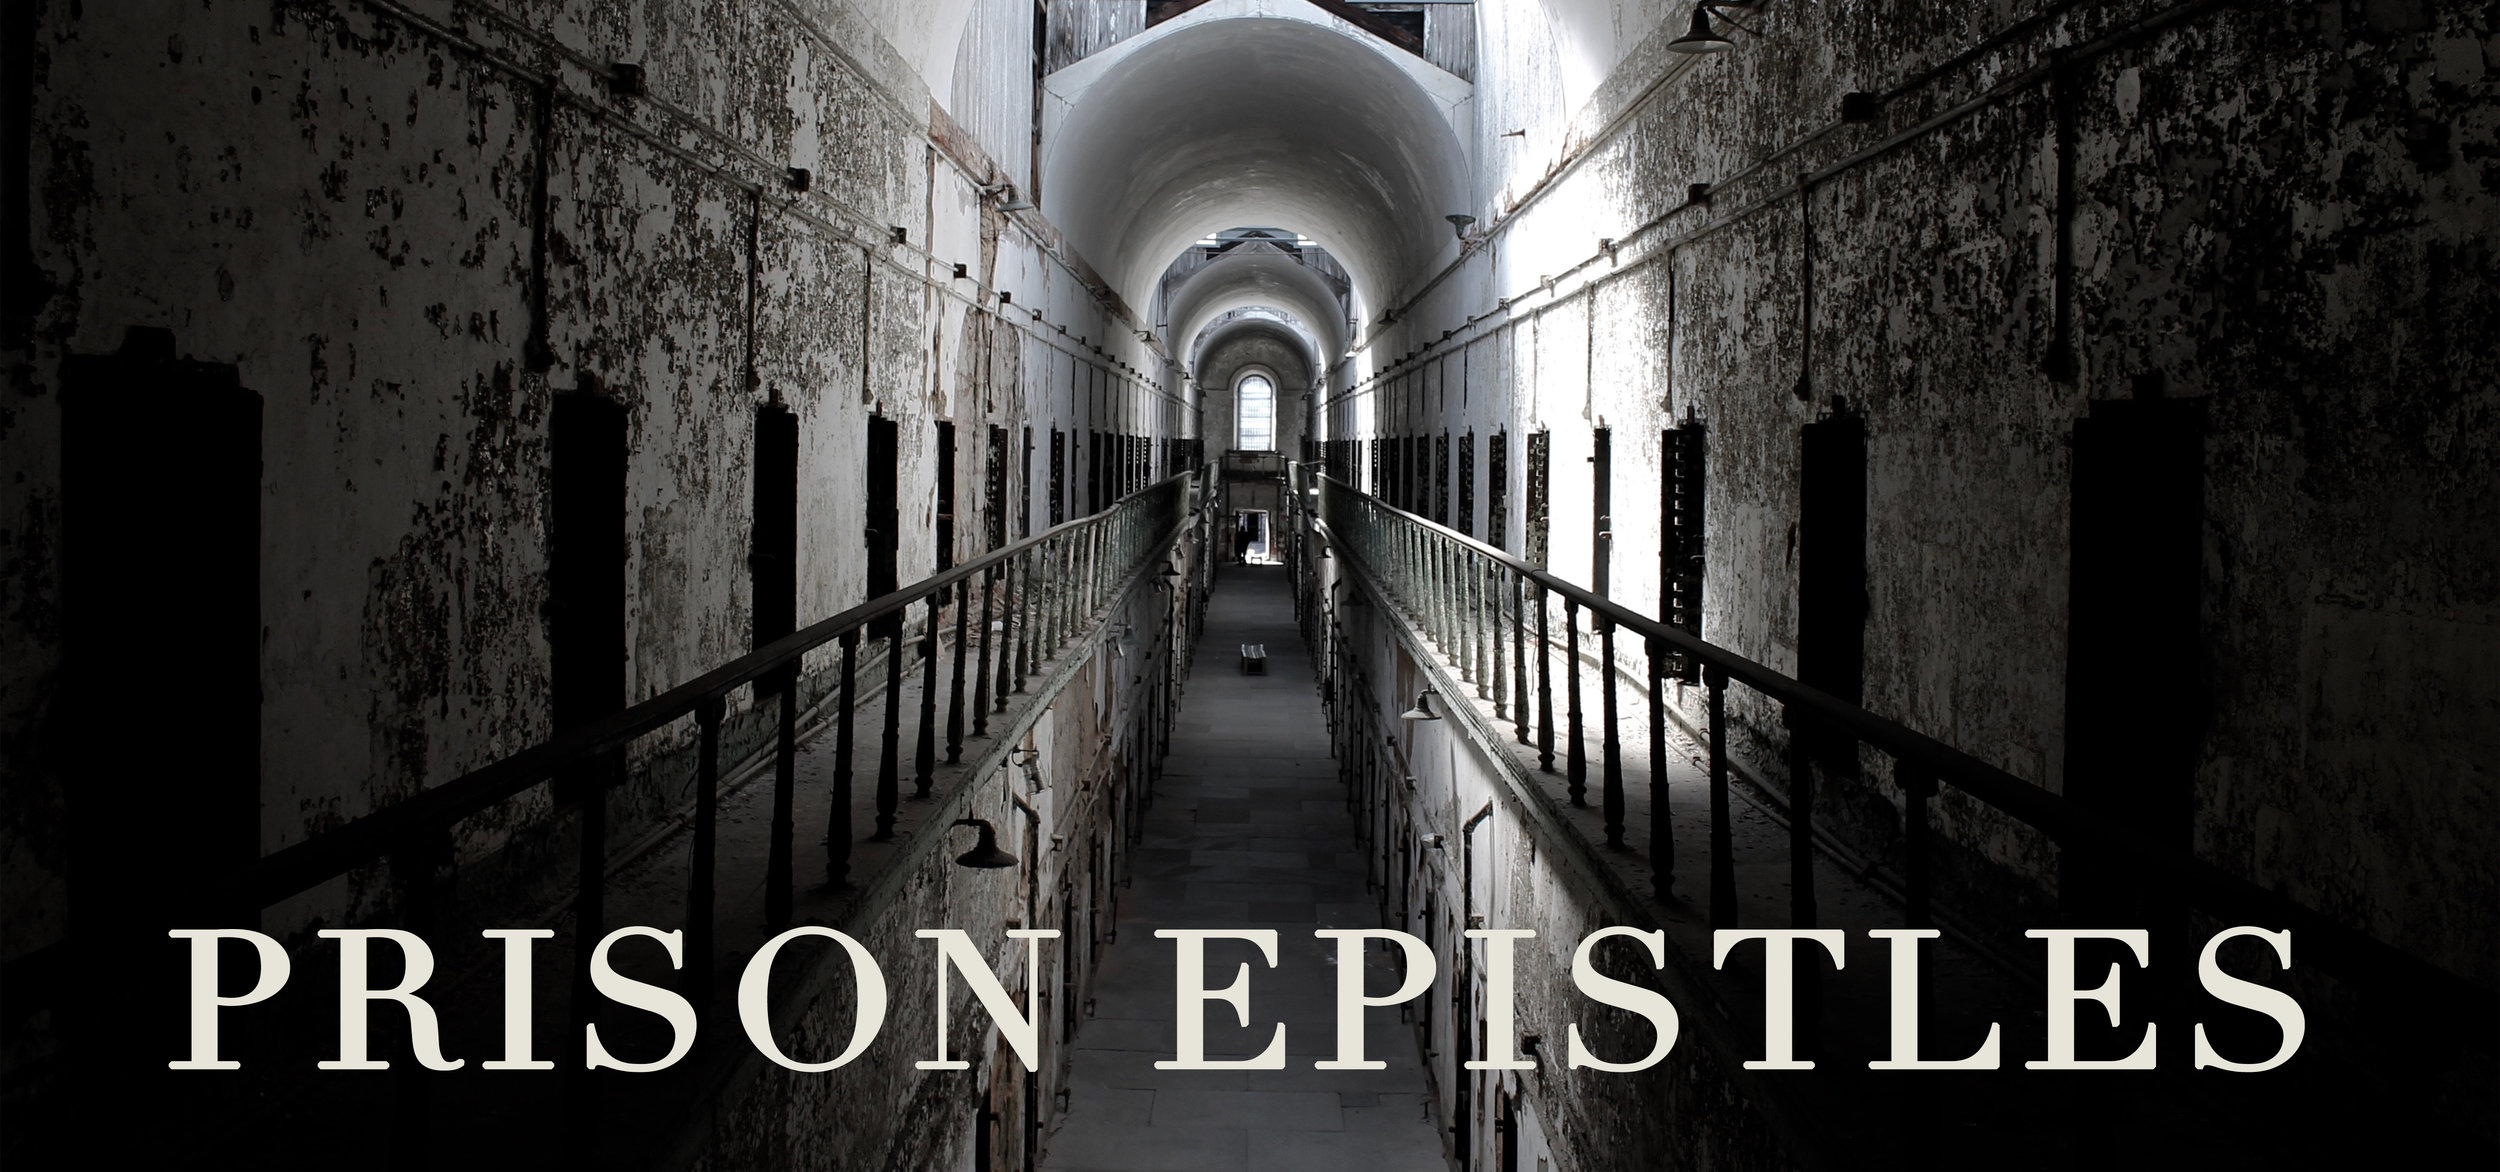 PrisonEpistlesWebImage.jpg